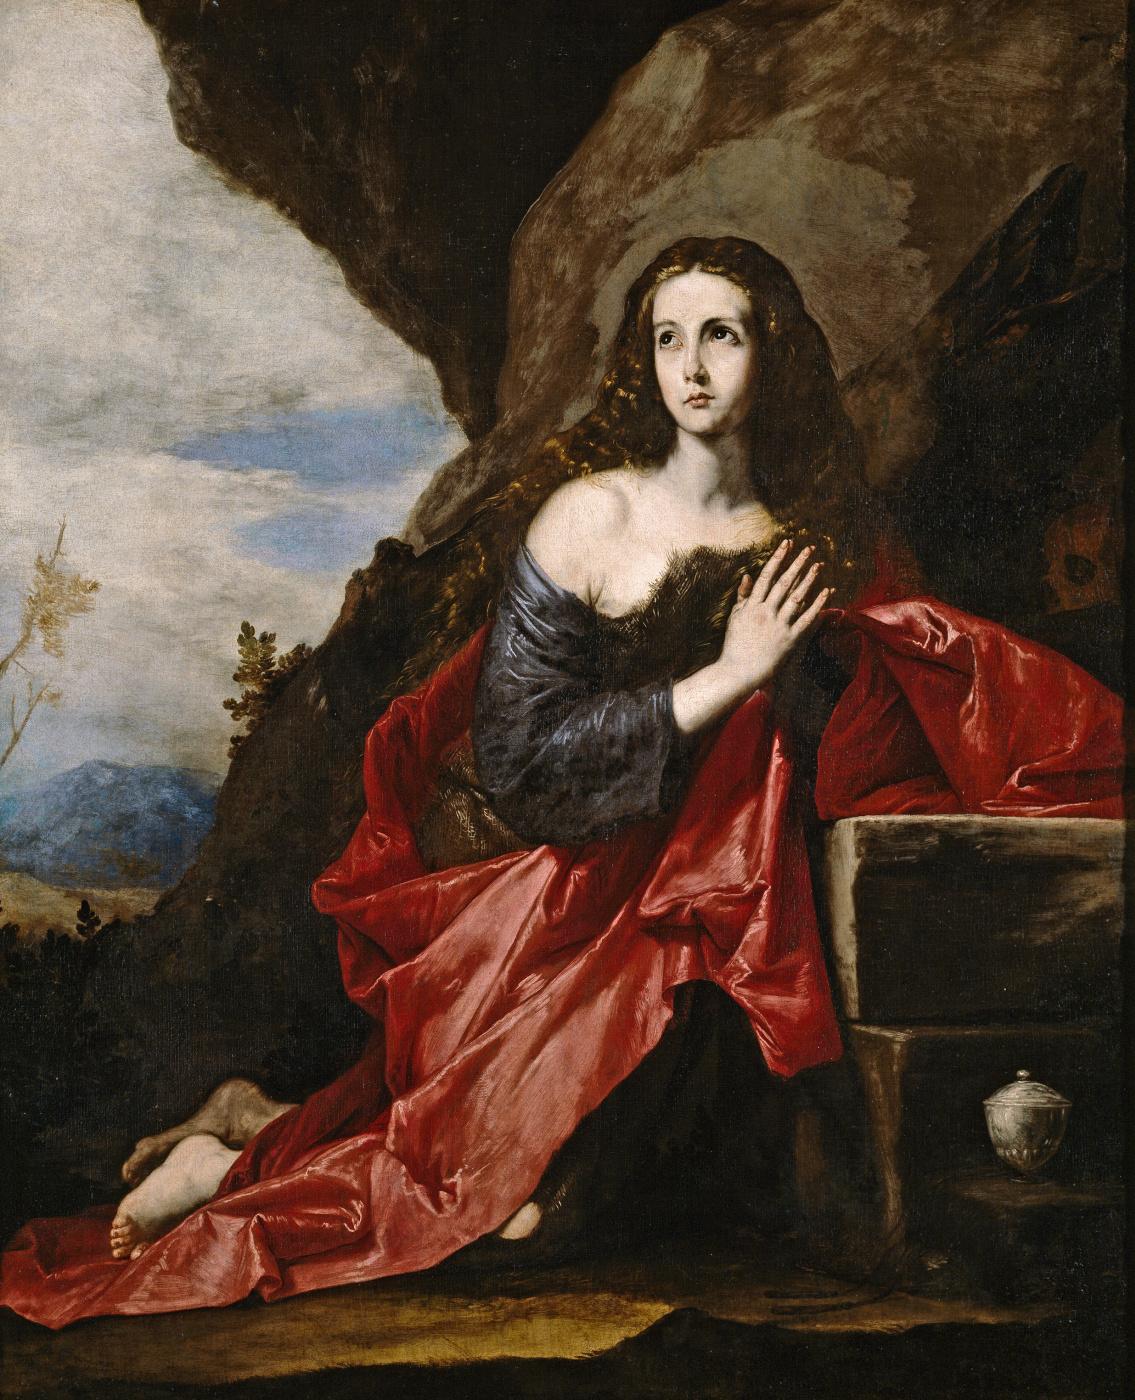 Jose de Ribera. Penitent Mary Magdalene